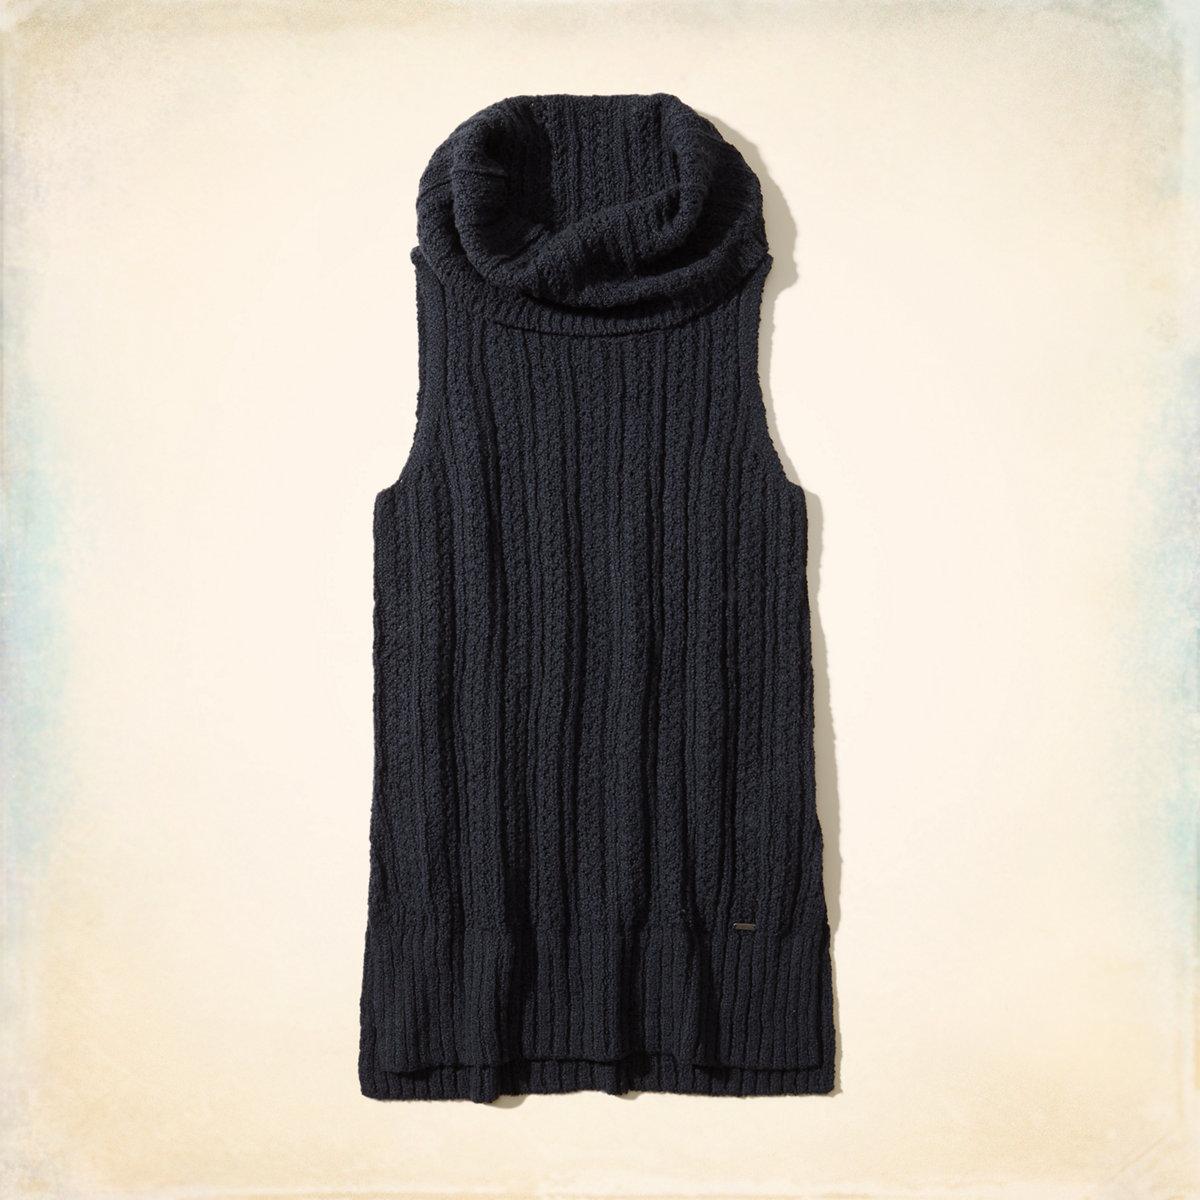 Sleeveless Cowl Neck Tunic Sweater